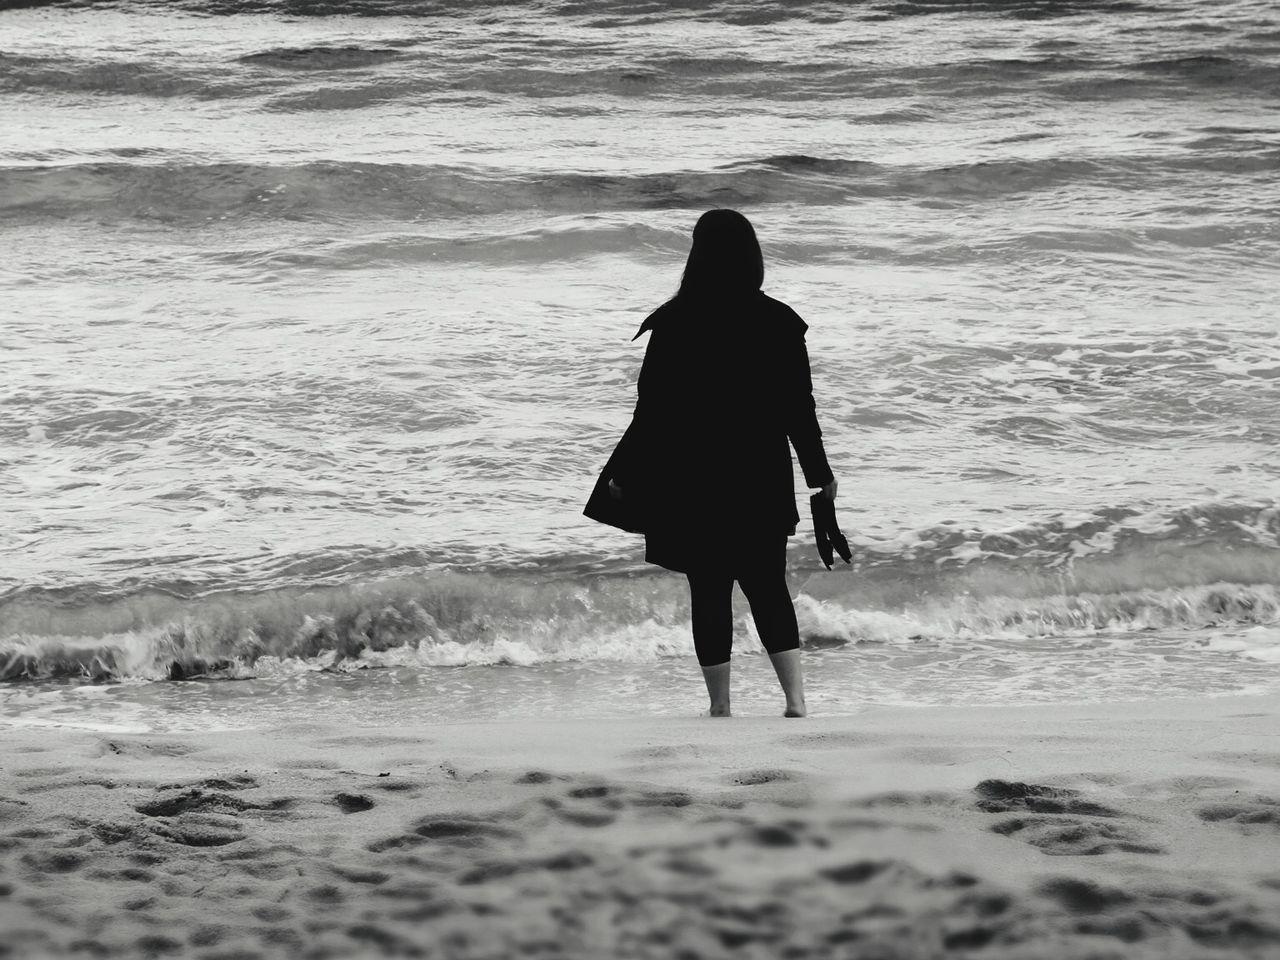 Open Edit EyeEm Best Shots New Filters Monochrome Blackandwhite Blackandwhite Photography EyeEm 5.0 Woman Beachphotography The EyeEm Facebook Cover Challenge